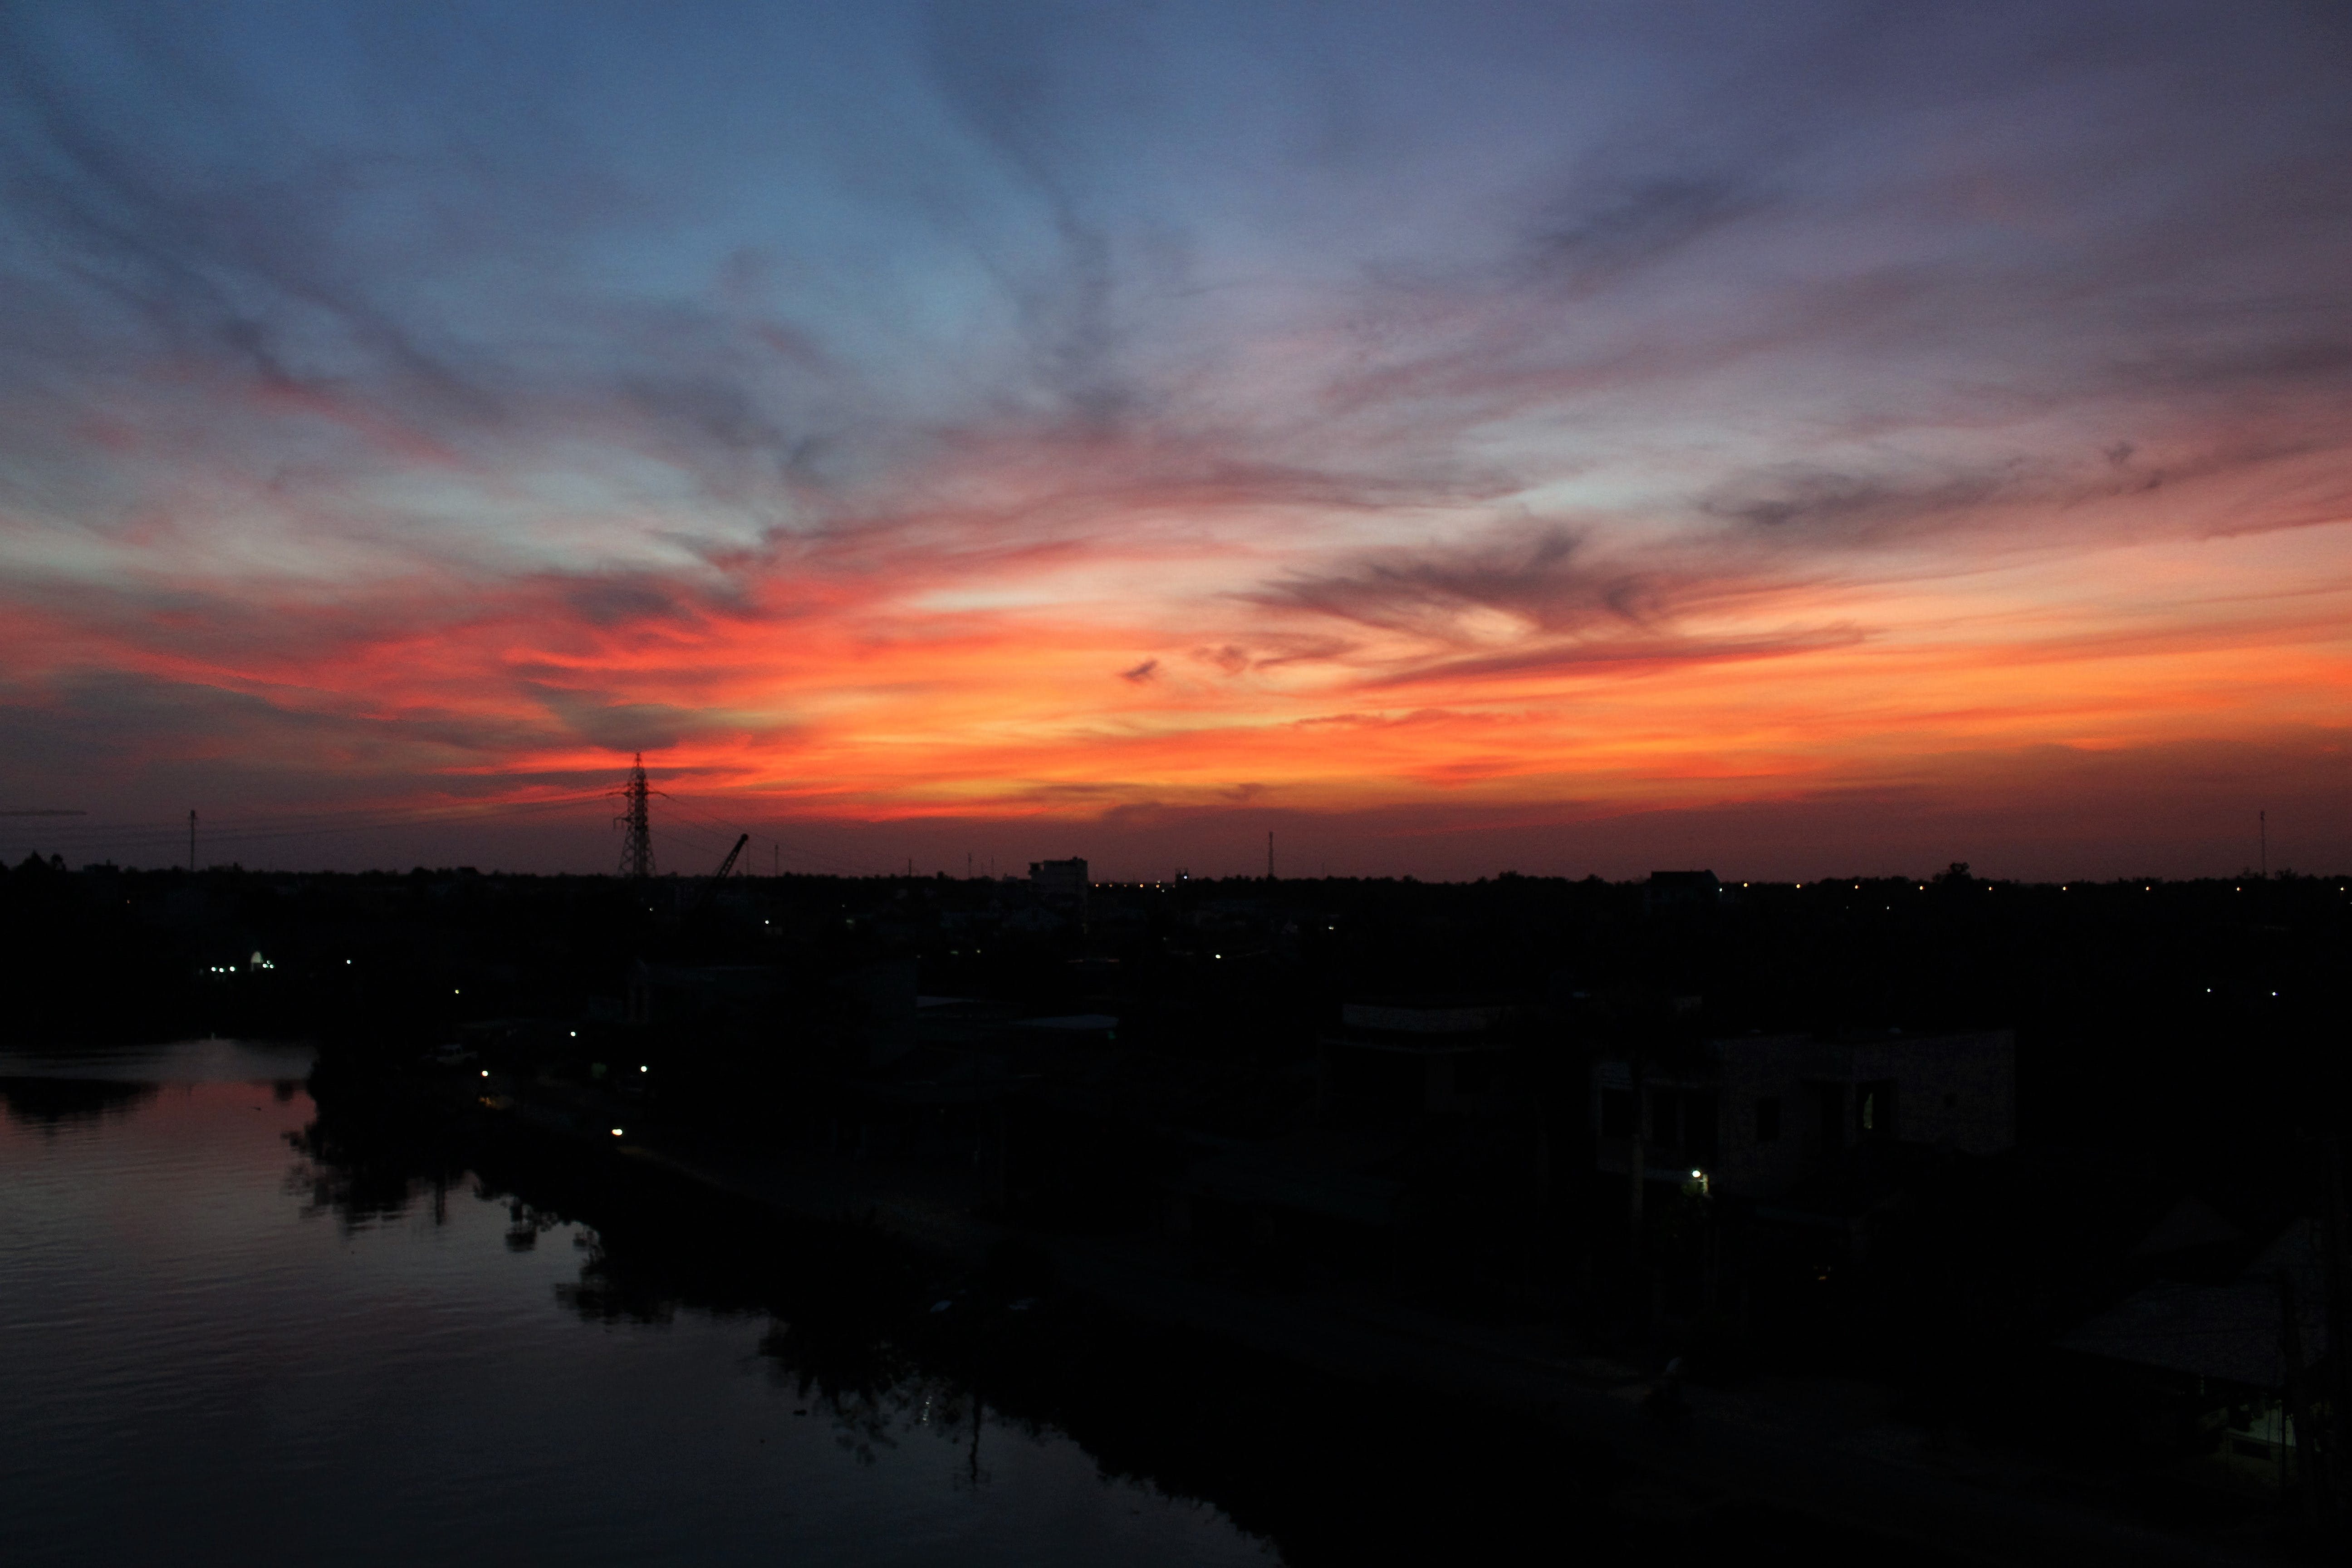 Silhouette Photo of Skyline Building Below Orange and Blue Sky